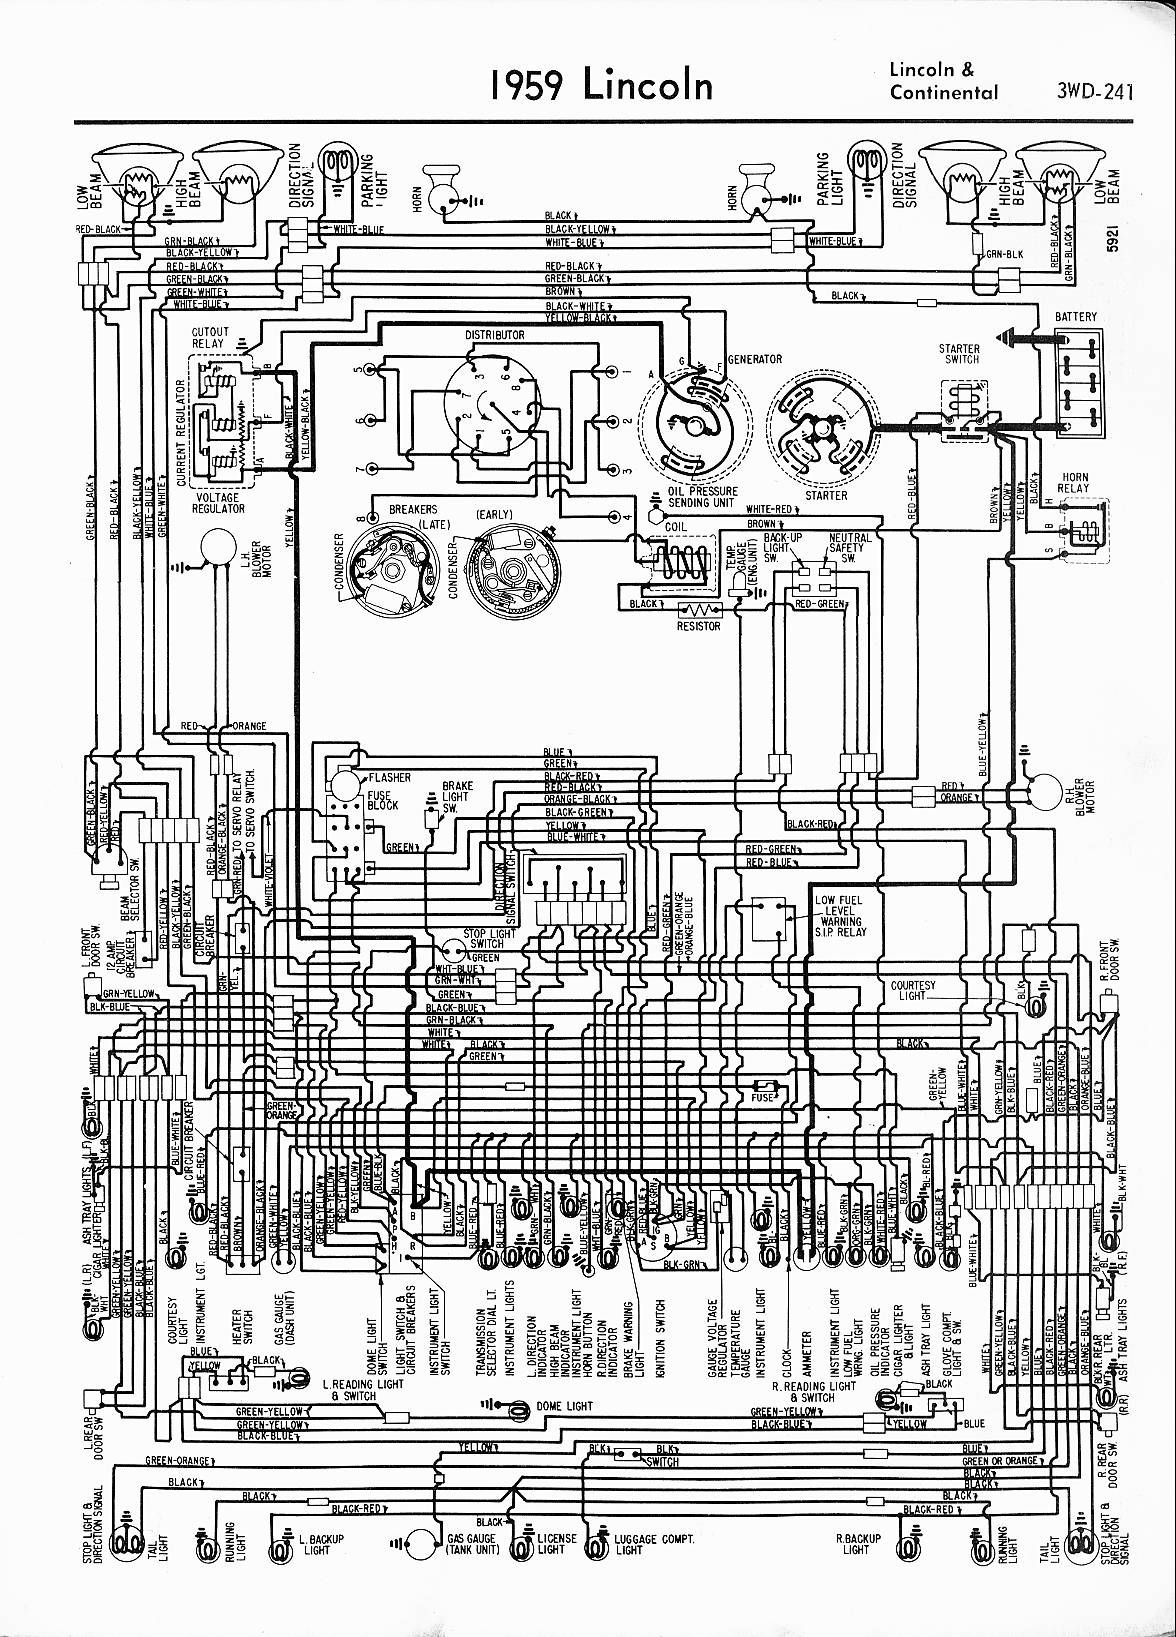 hight resolution of kinetic honda wiring diagram wiring diagram diagram wire verucci wiring diagram kinetic honda wiring diagram